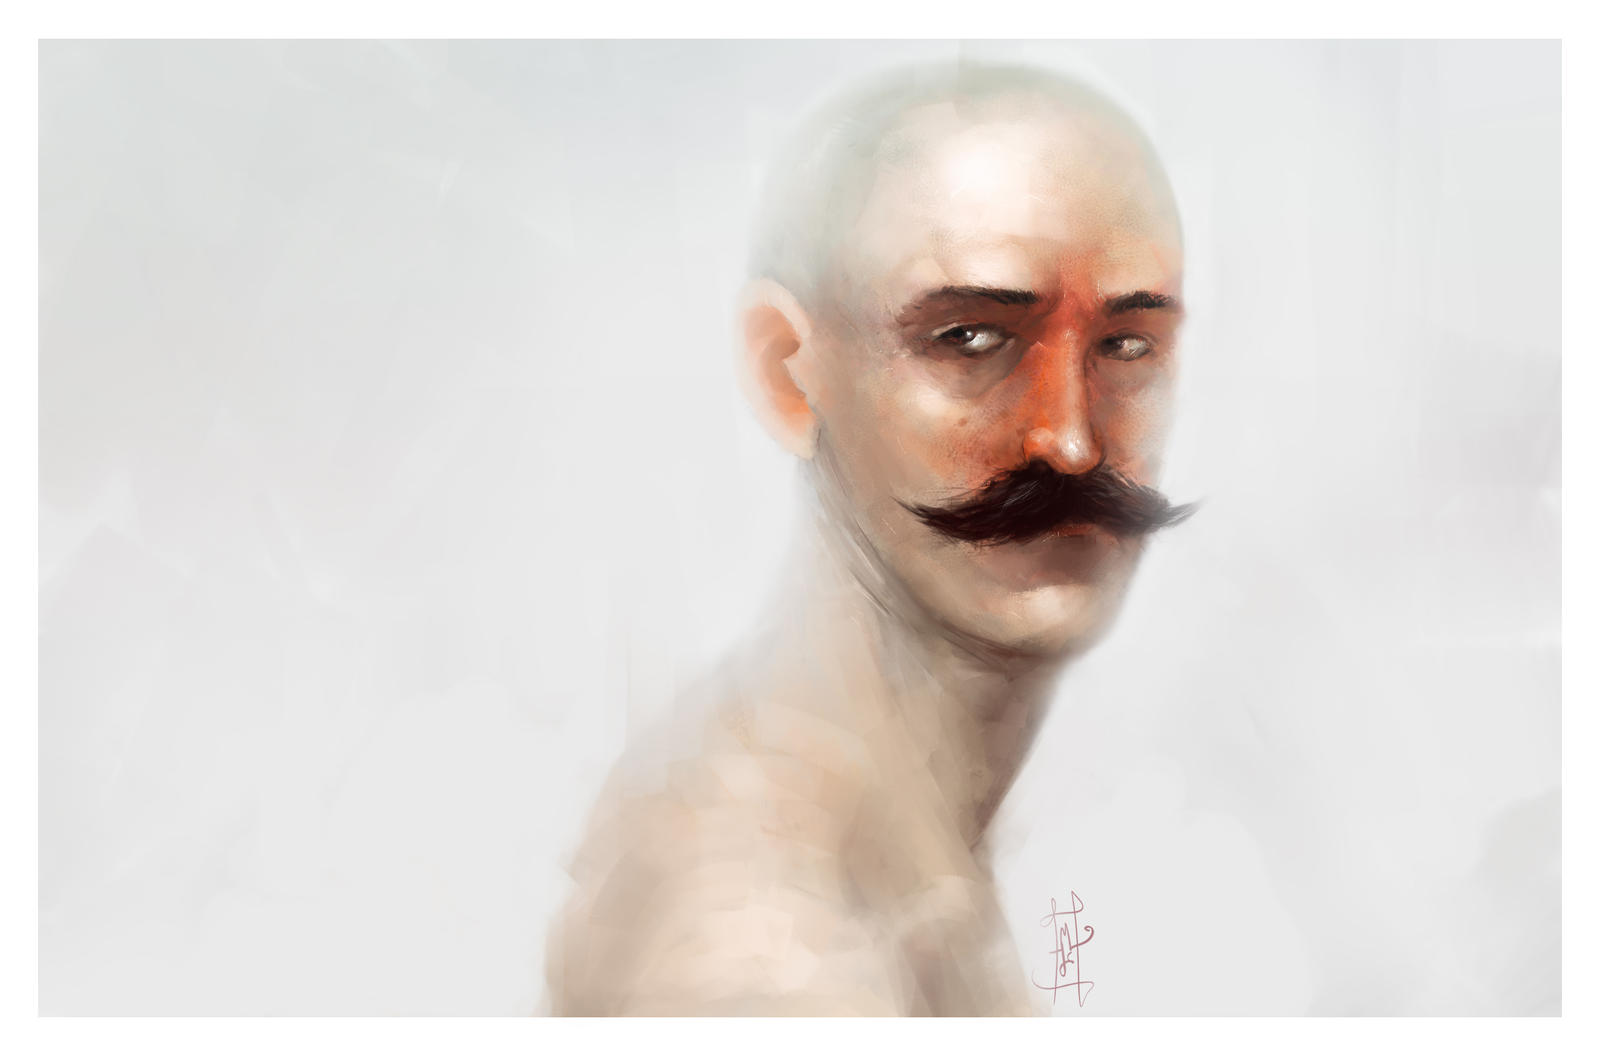 Moustache guy by Marcodalidingo